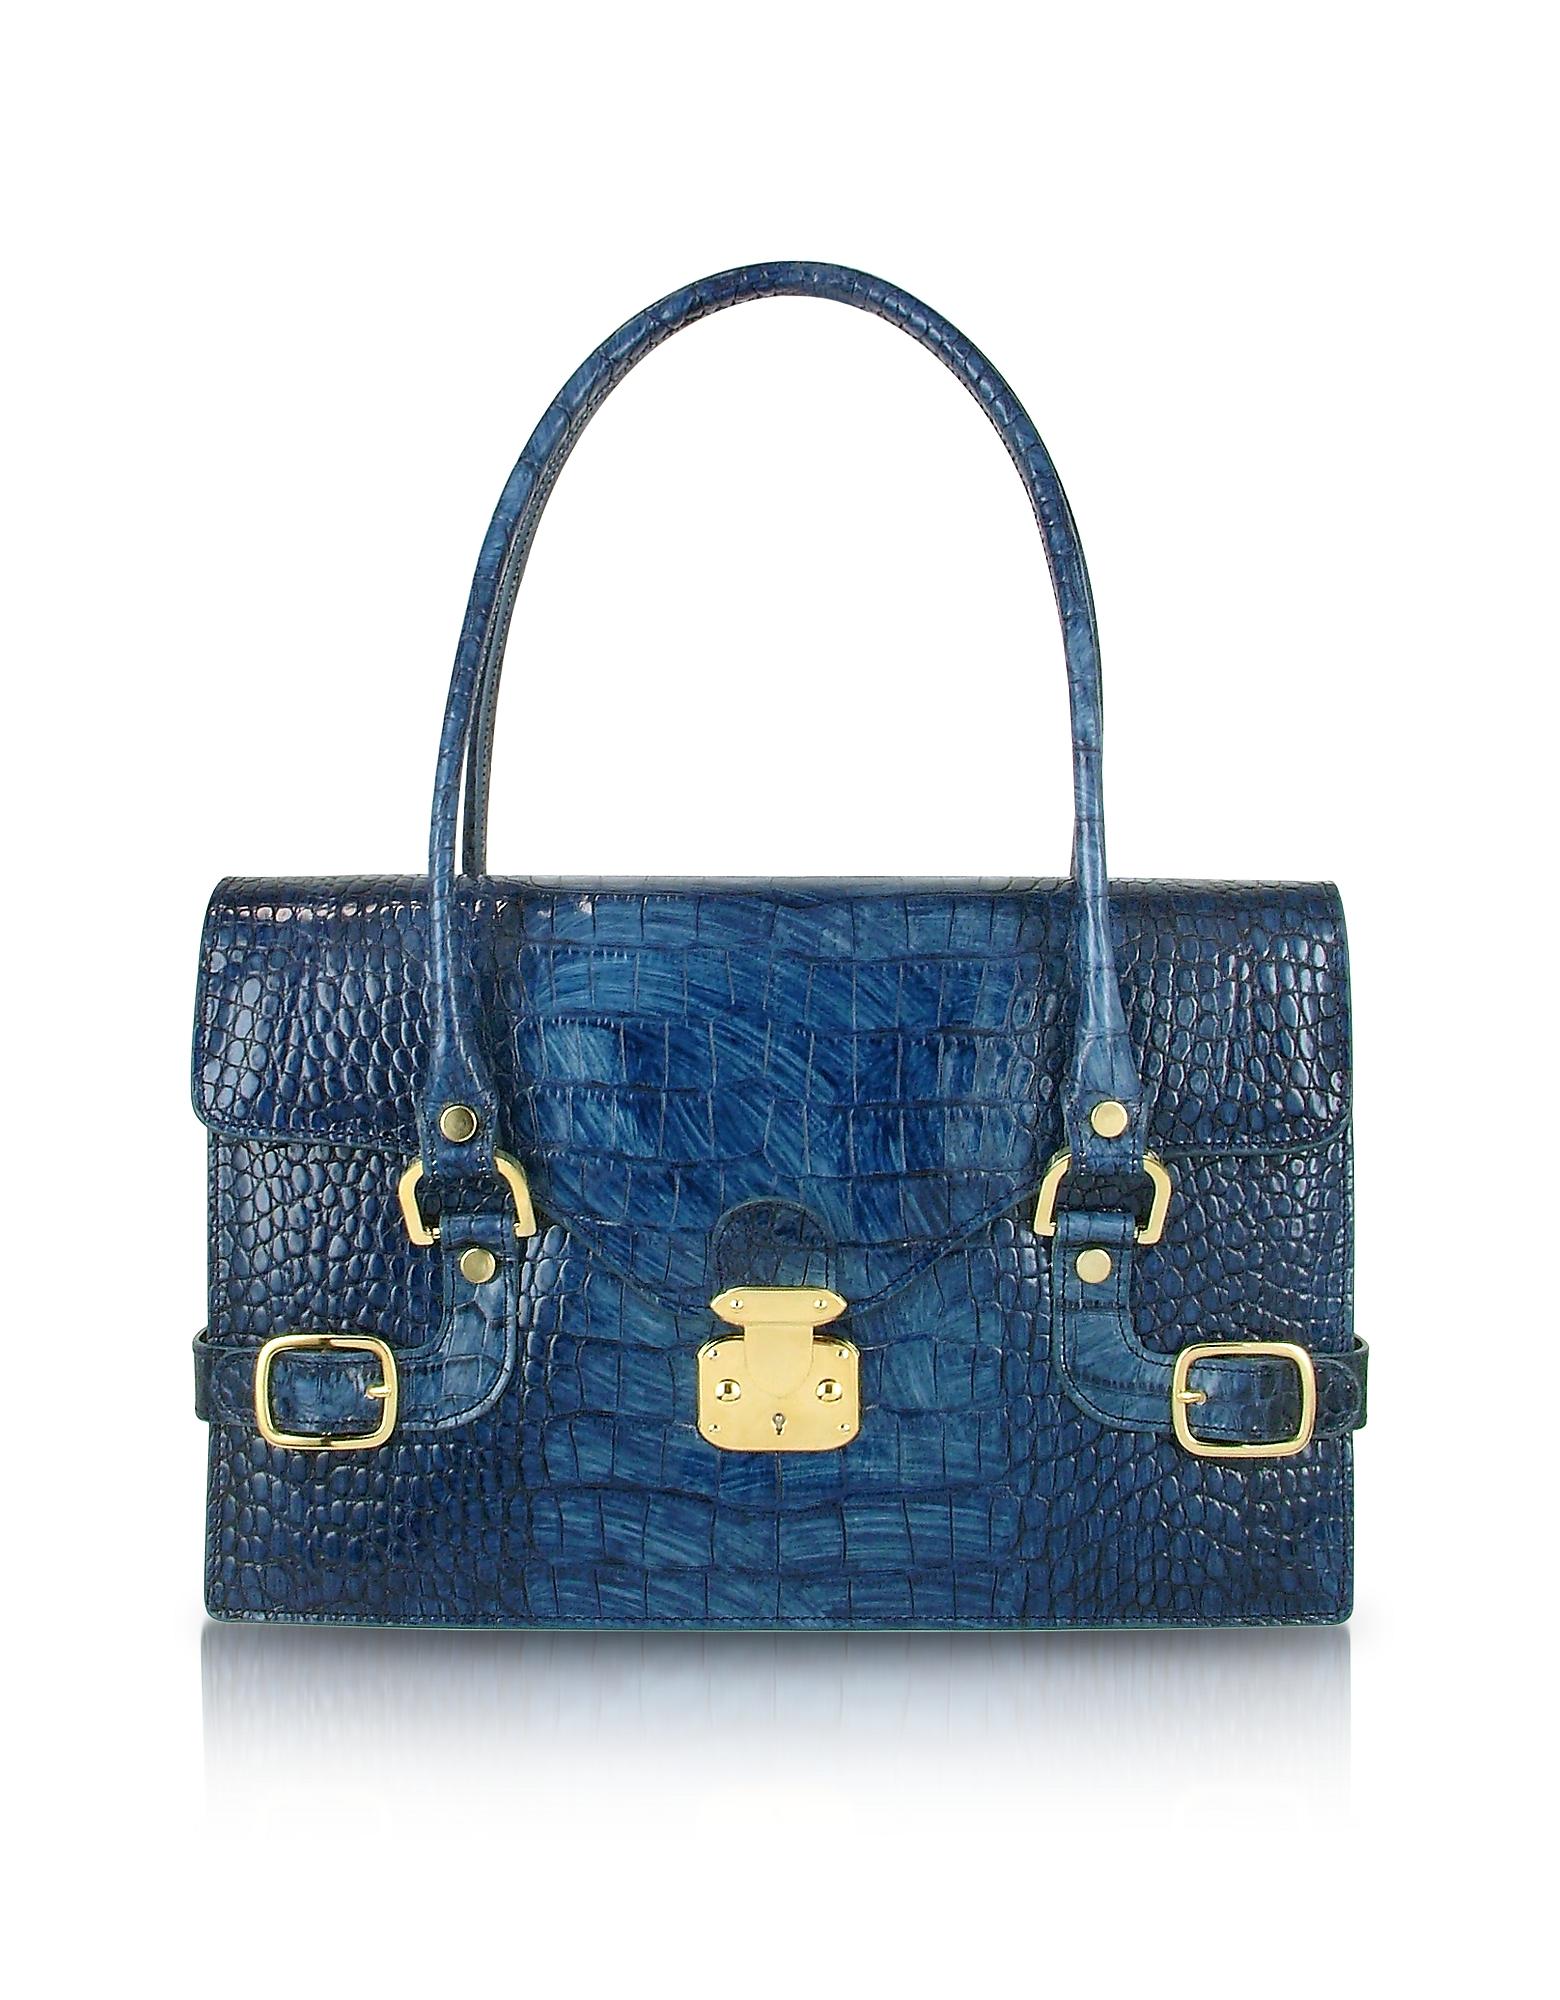 L.A.P.A. Designer Handbags, Indigo Blue Croco Stamped Italian Leather Shoulder Bag